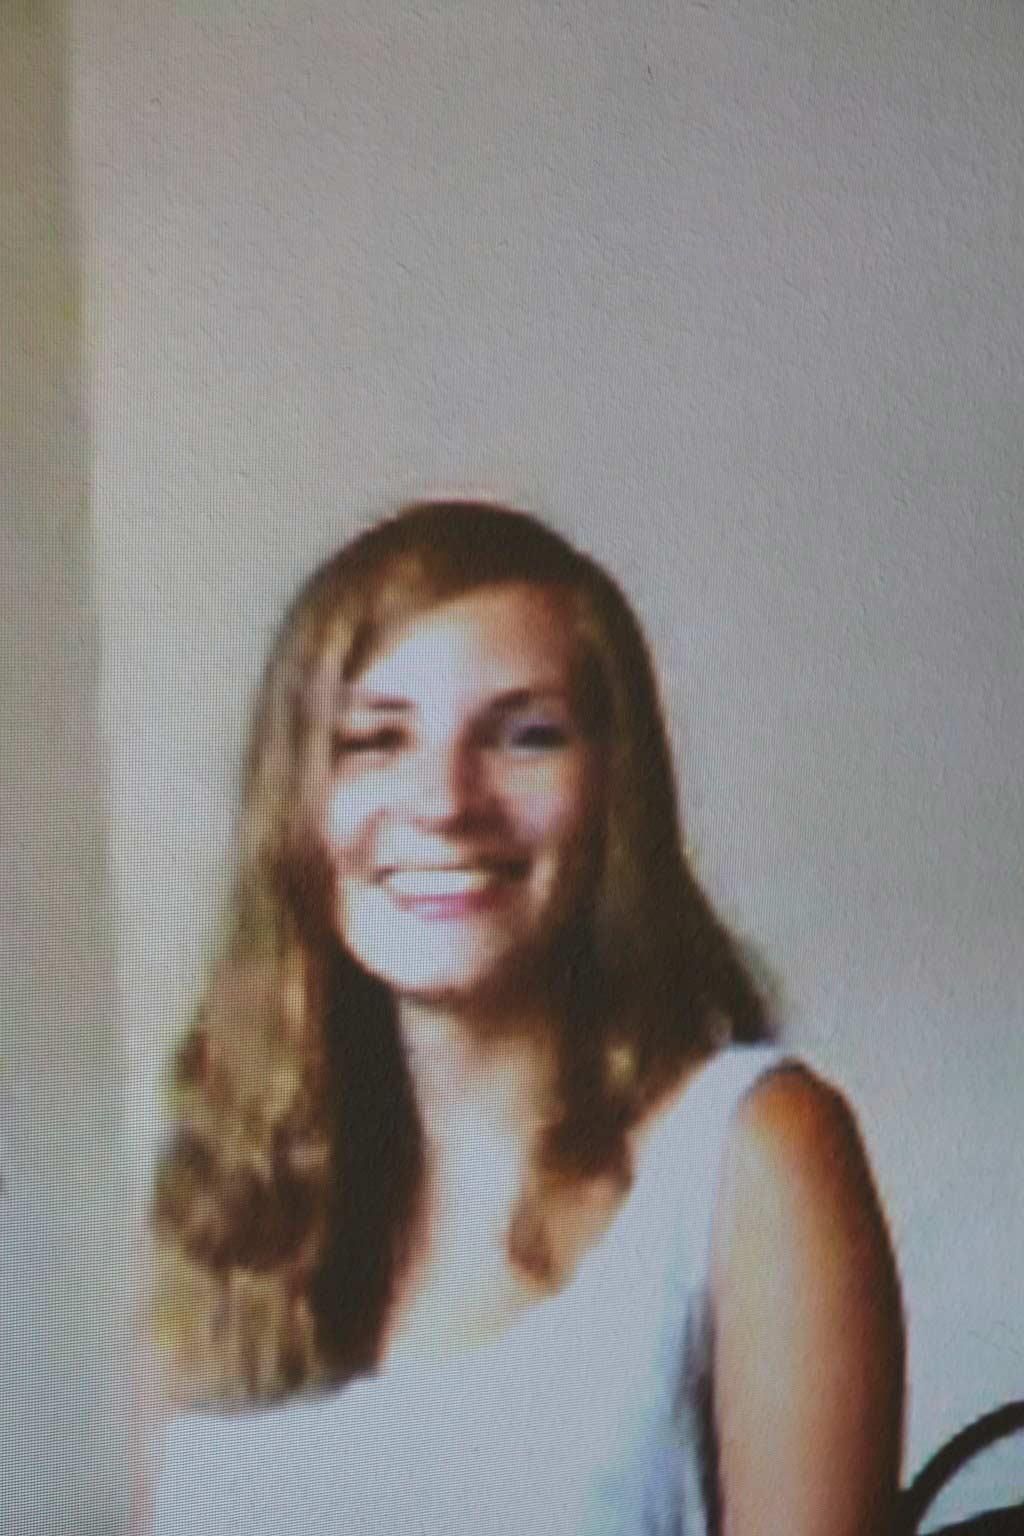 ANNA MARIA, 26, PADOVA, ITALY annamtandandand933